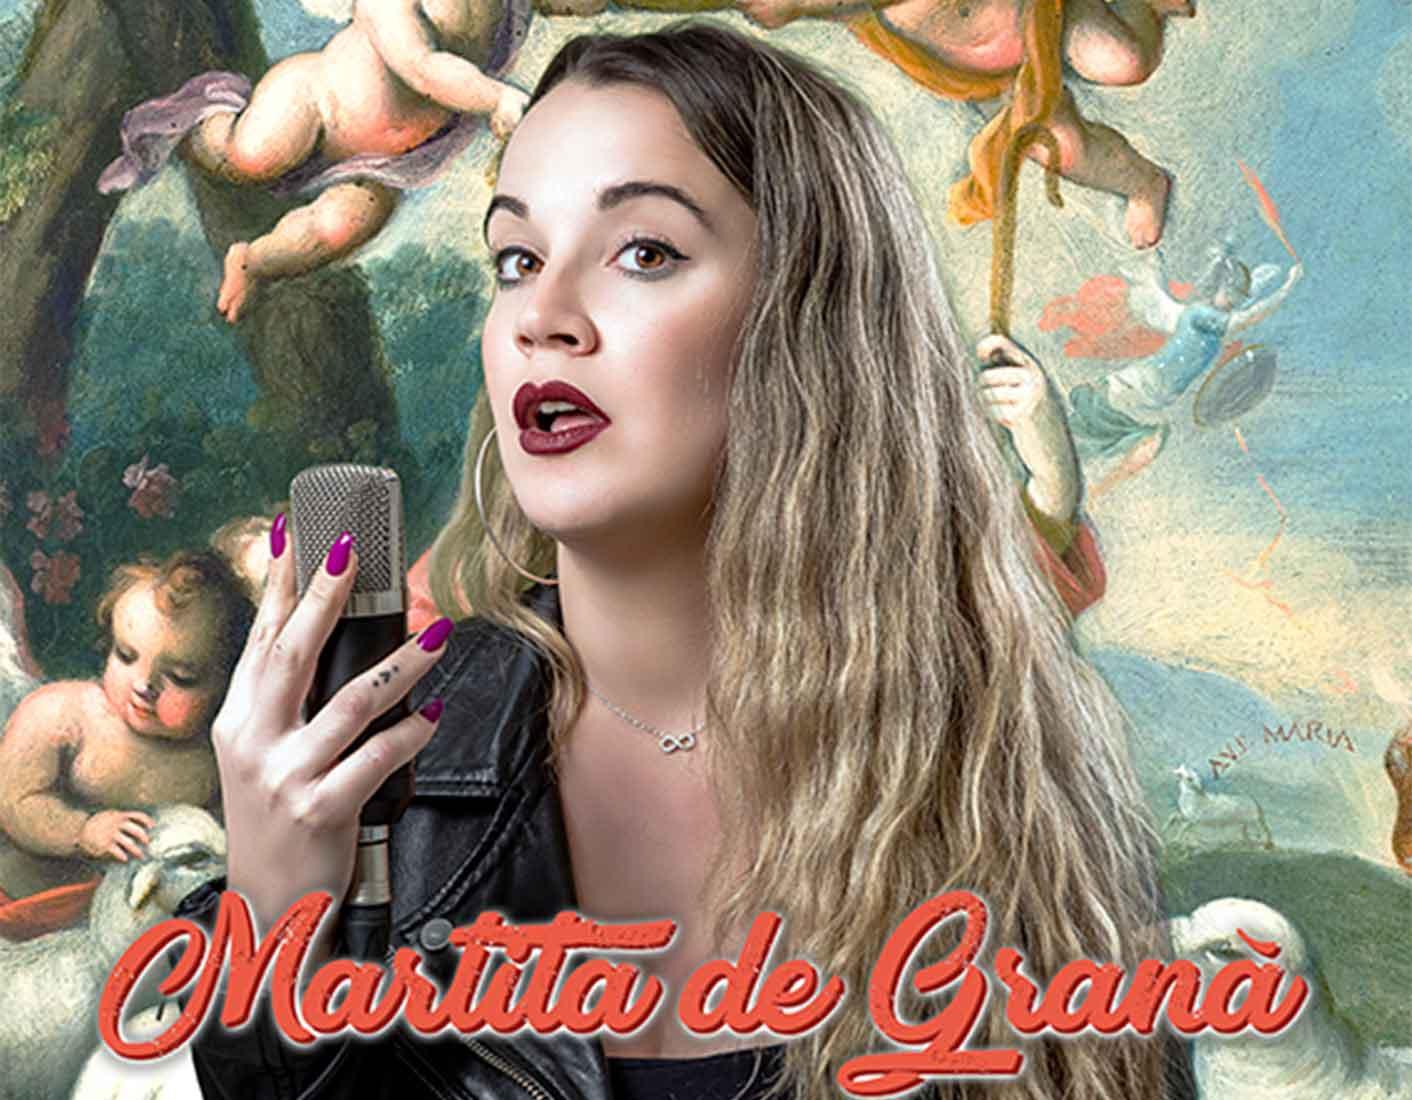 martita-de-grana-en-velez-rubio-5de52925bc804.jpeg